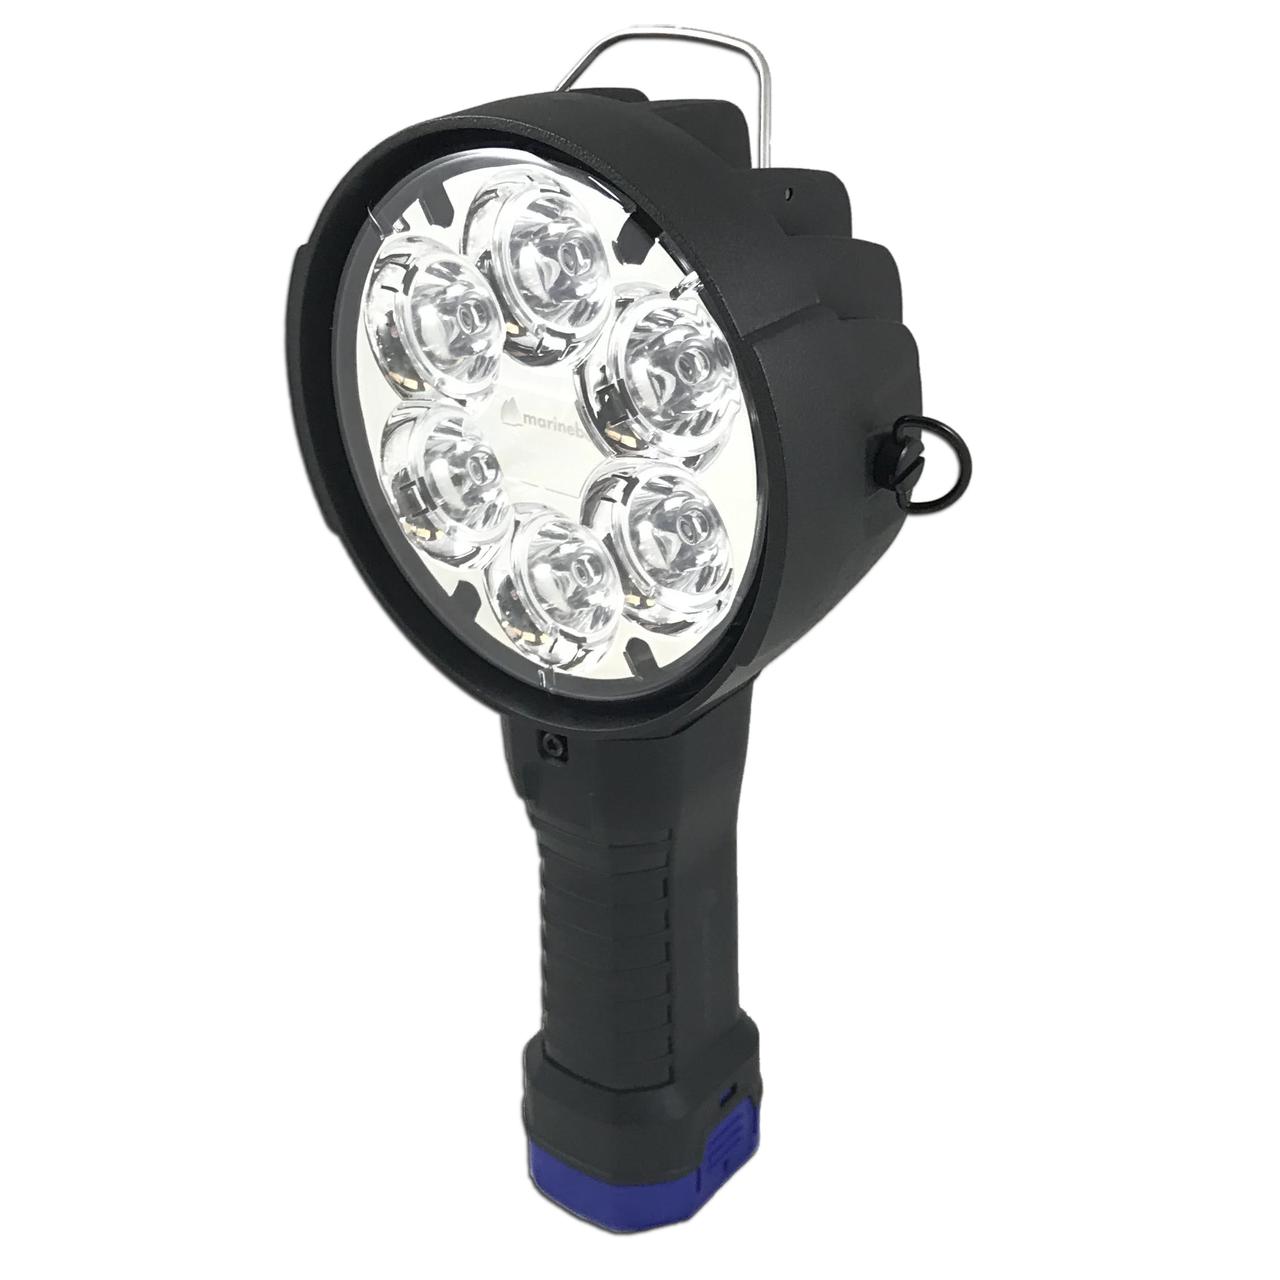 Marinebeam Handheld Rechargeable LED Spotlight